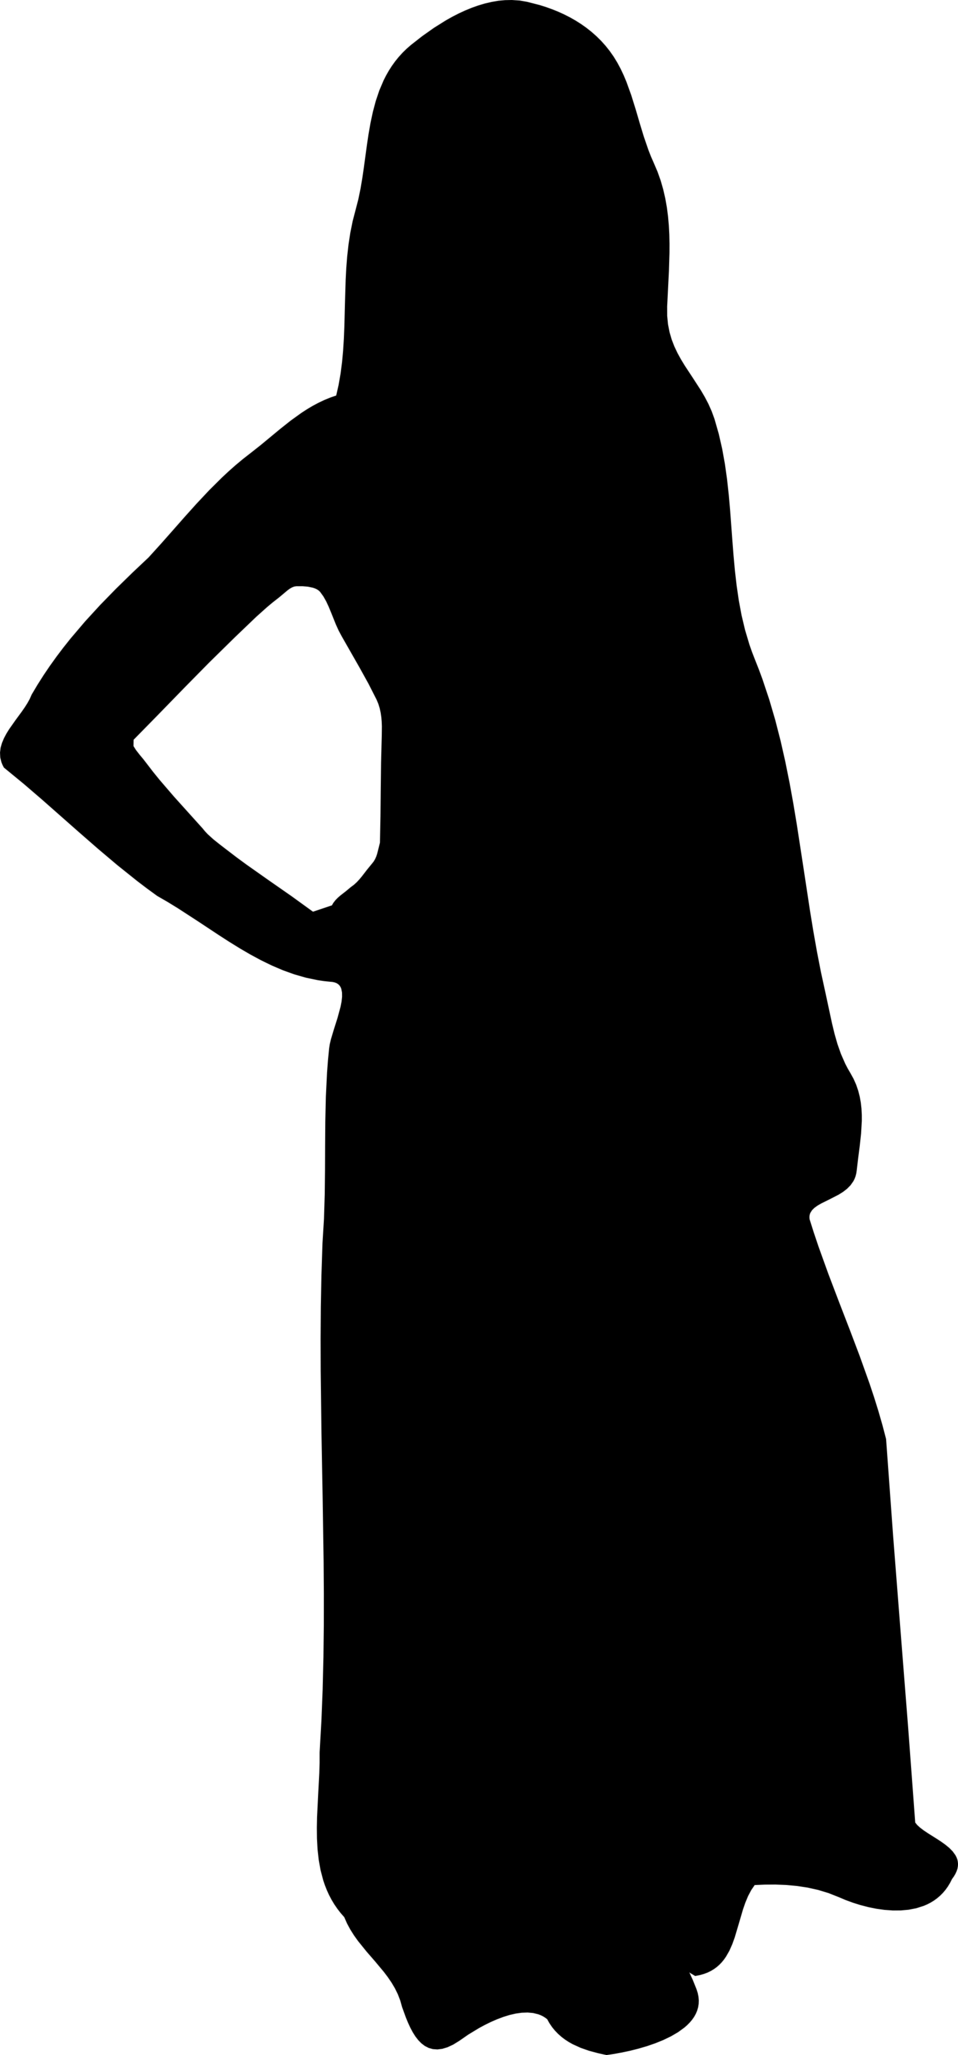 958x2055 Public Domain Clip Art Image Illustration Of A Female Silhouette